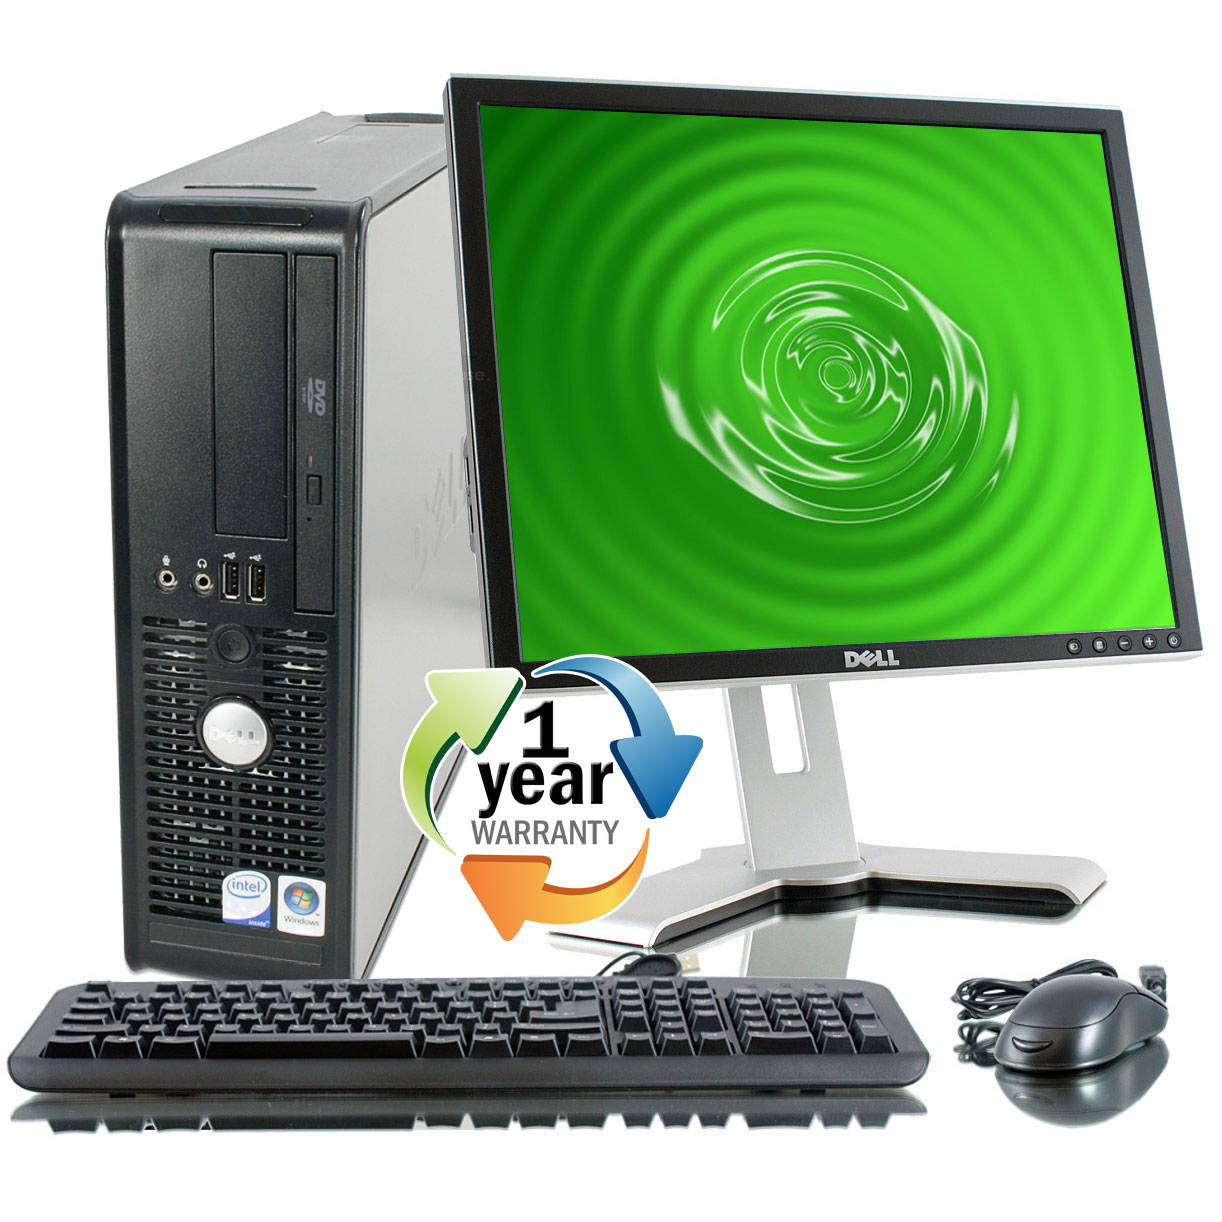 "Dell REFURBISHED Dell Optiplex 780 3.0GHz 2GB 400GB DVD Win 7 Home Desktop Computer + 17"" LCD at Sears.com"